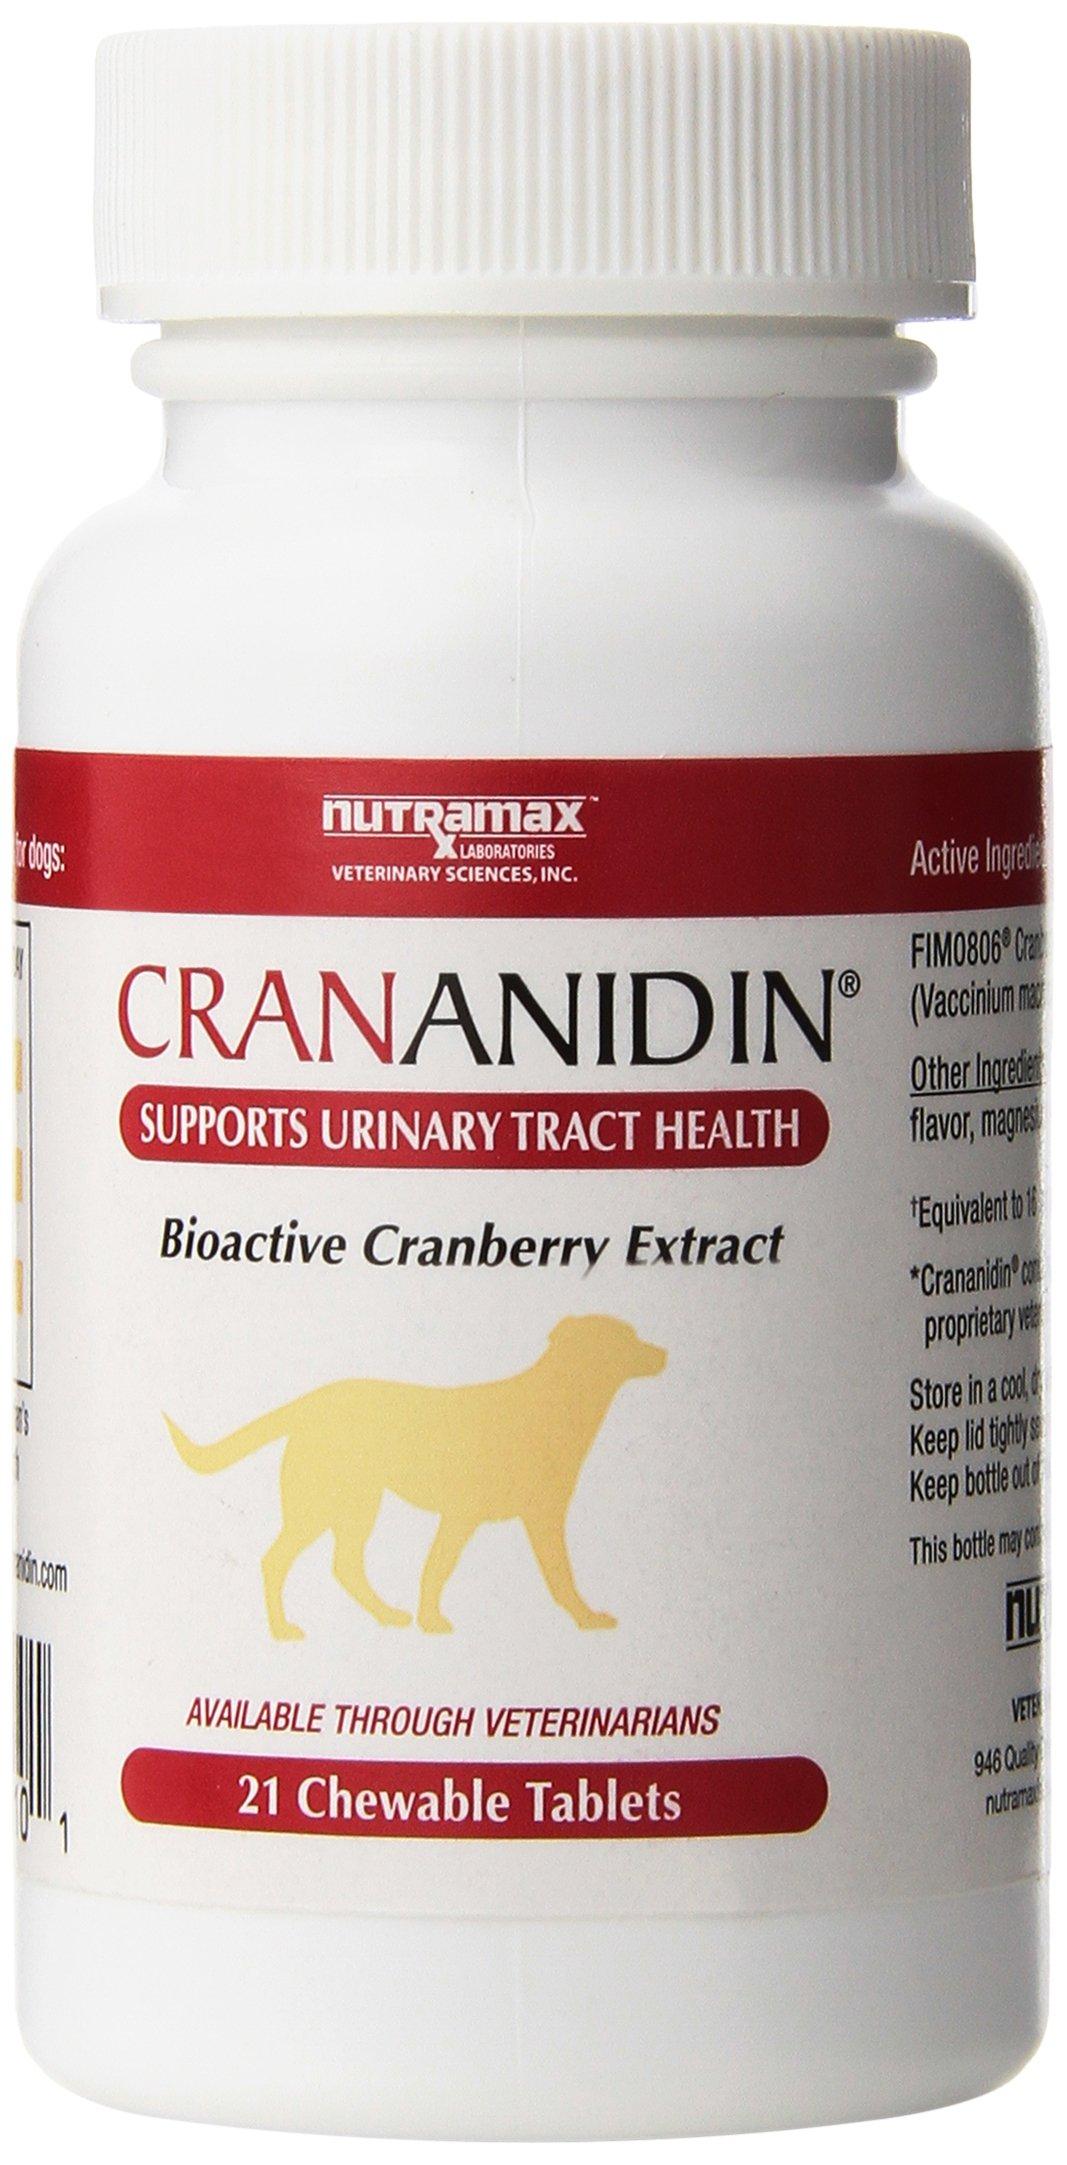 Nutramax Crananidin Pet Supplement 1